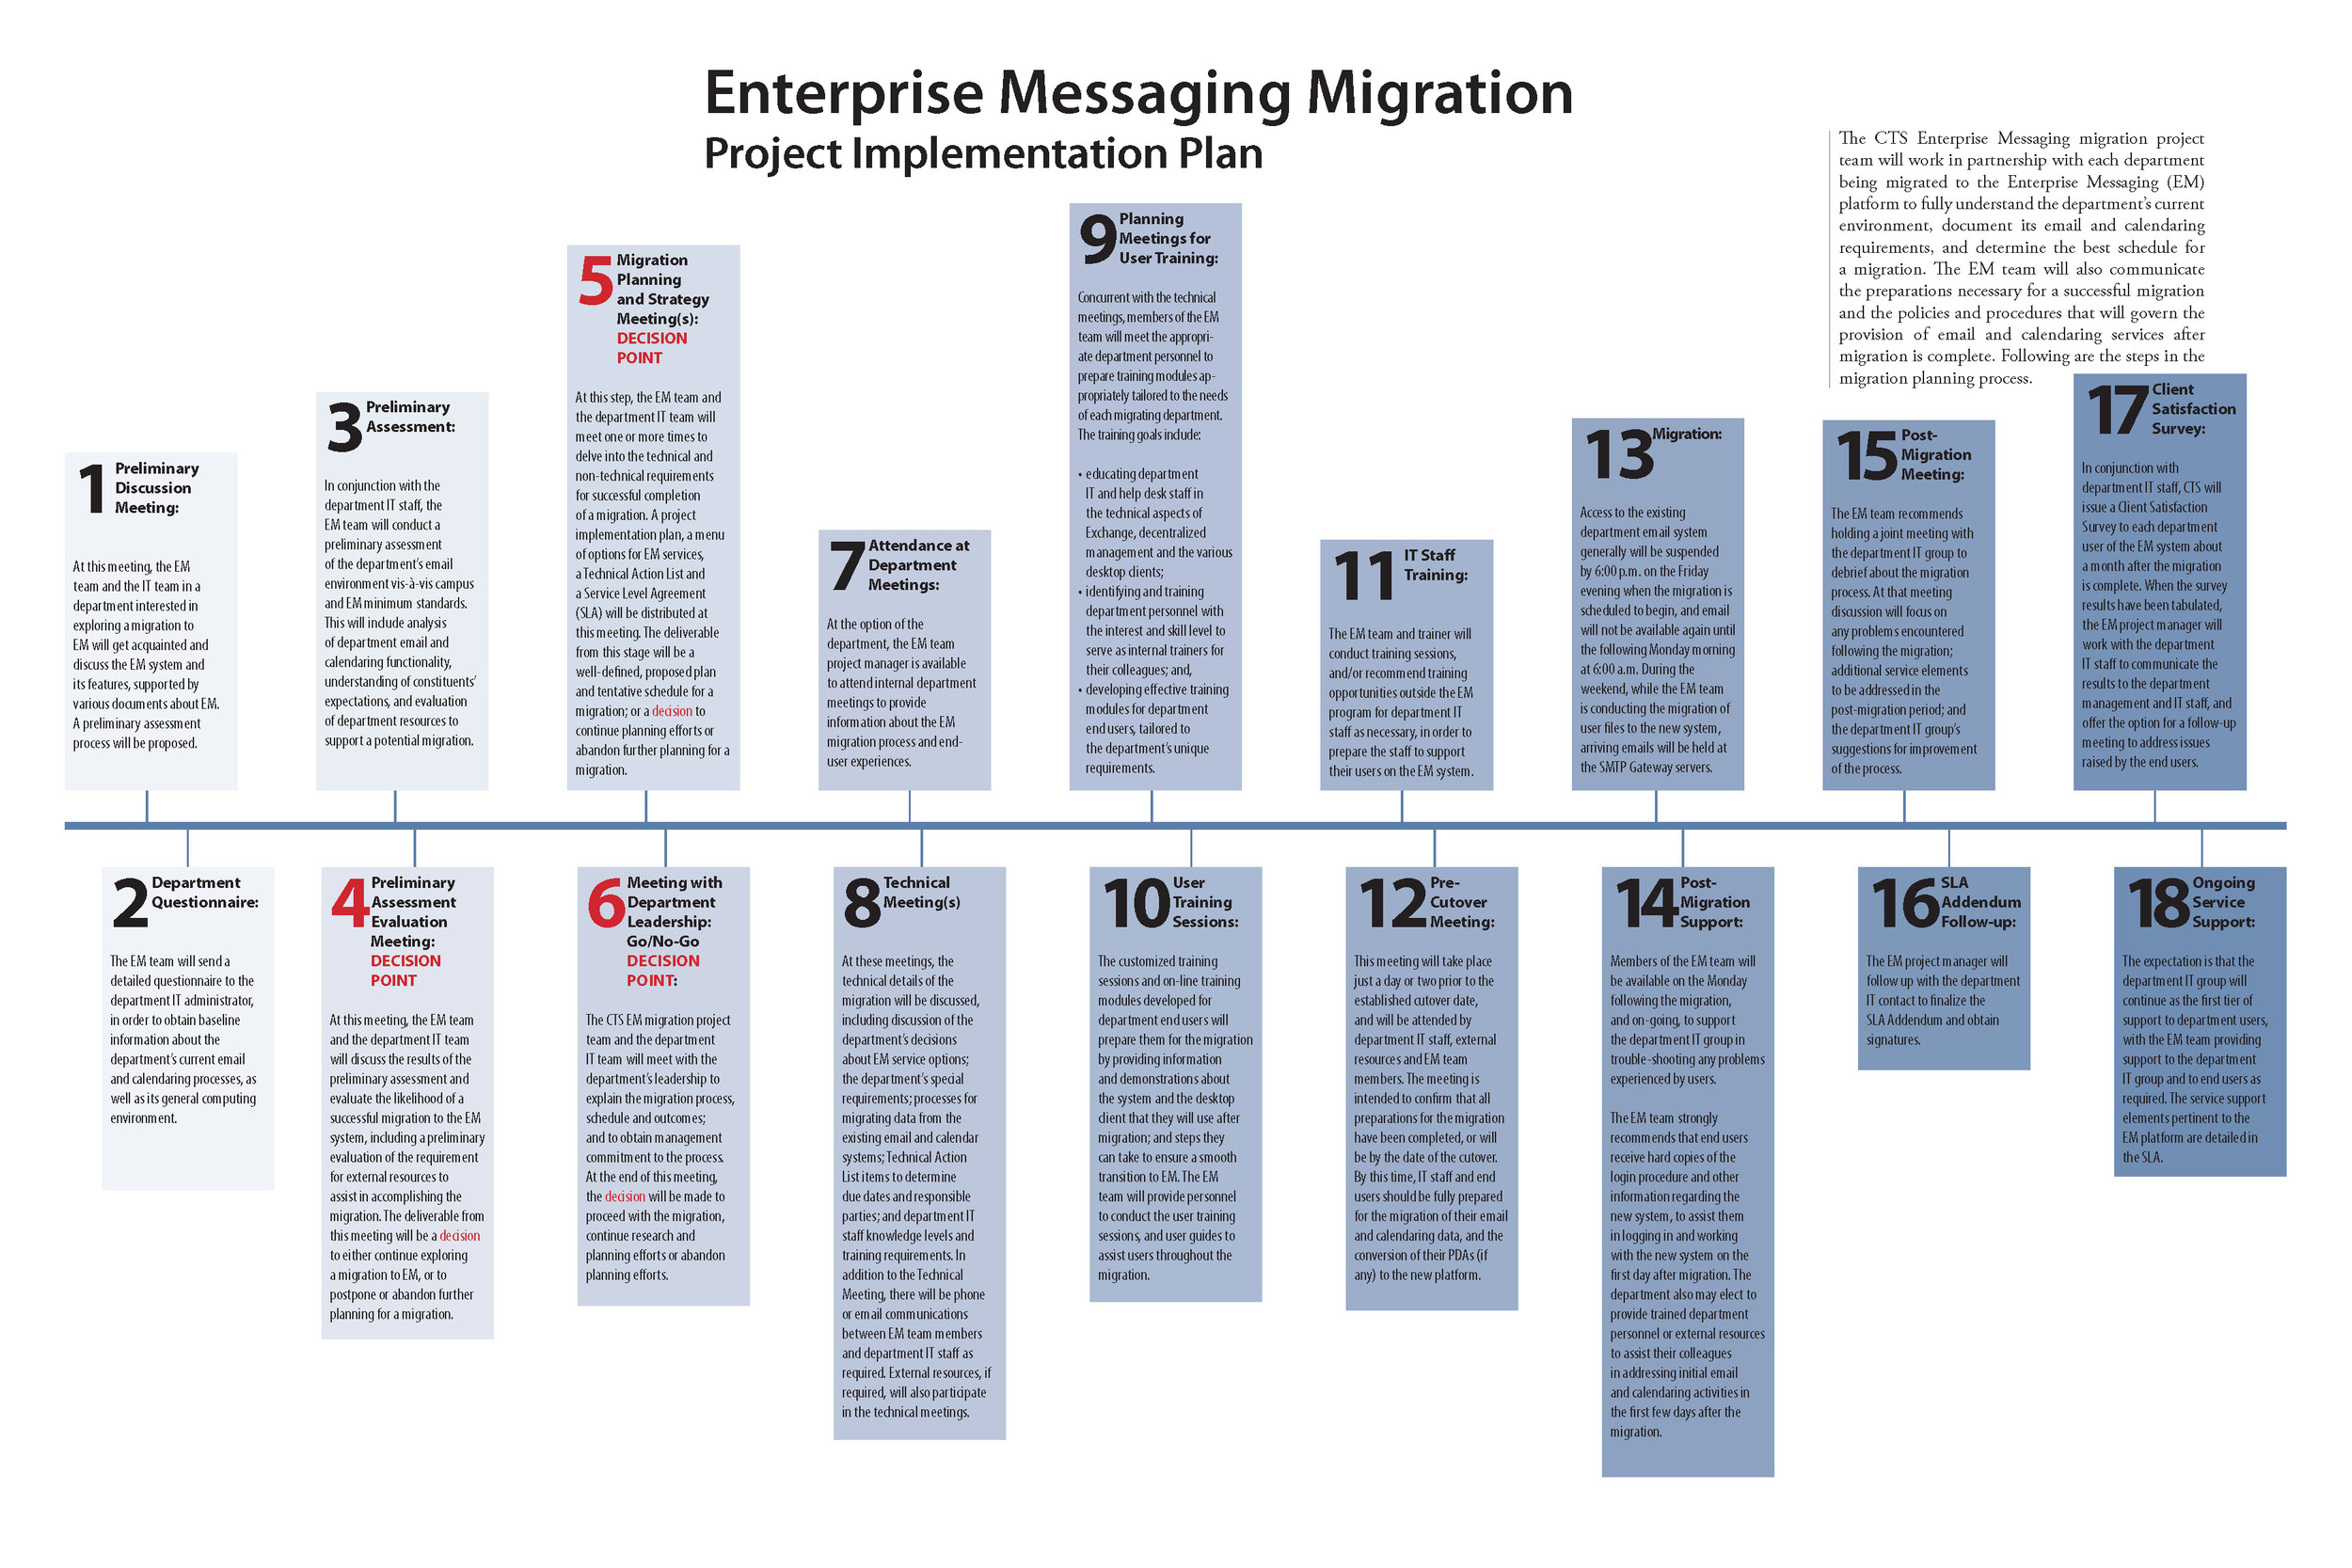 Enterprise Messaging migration